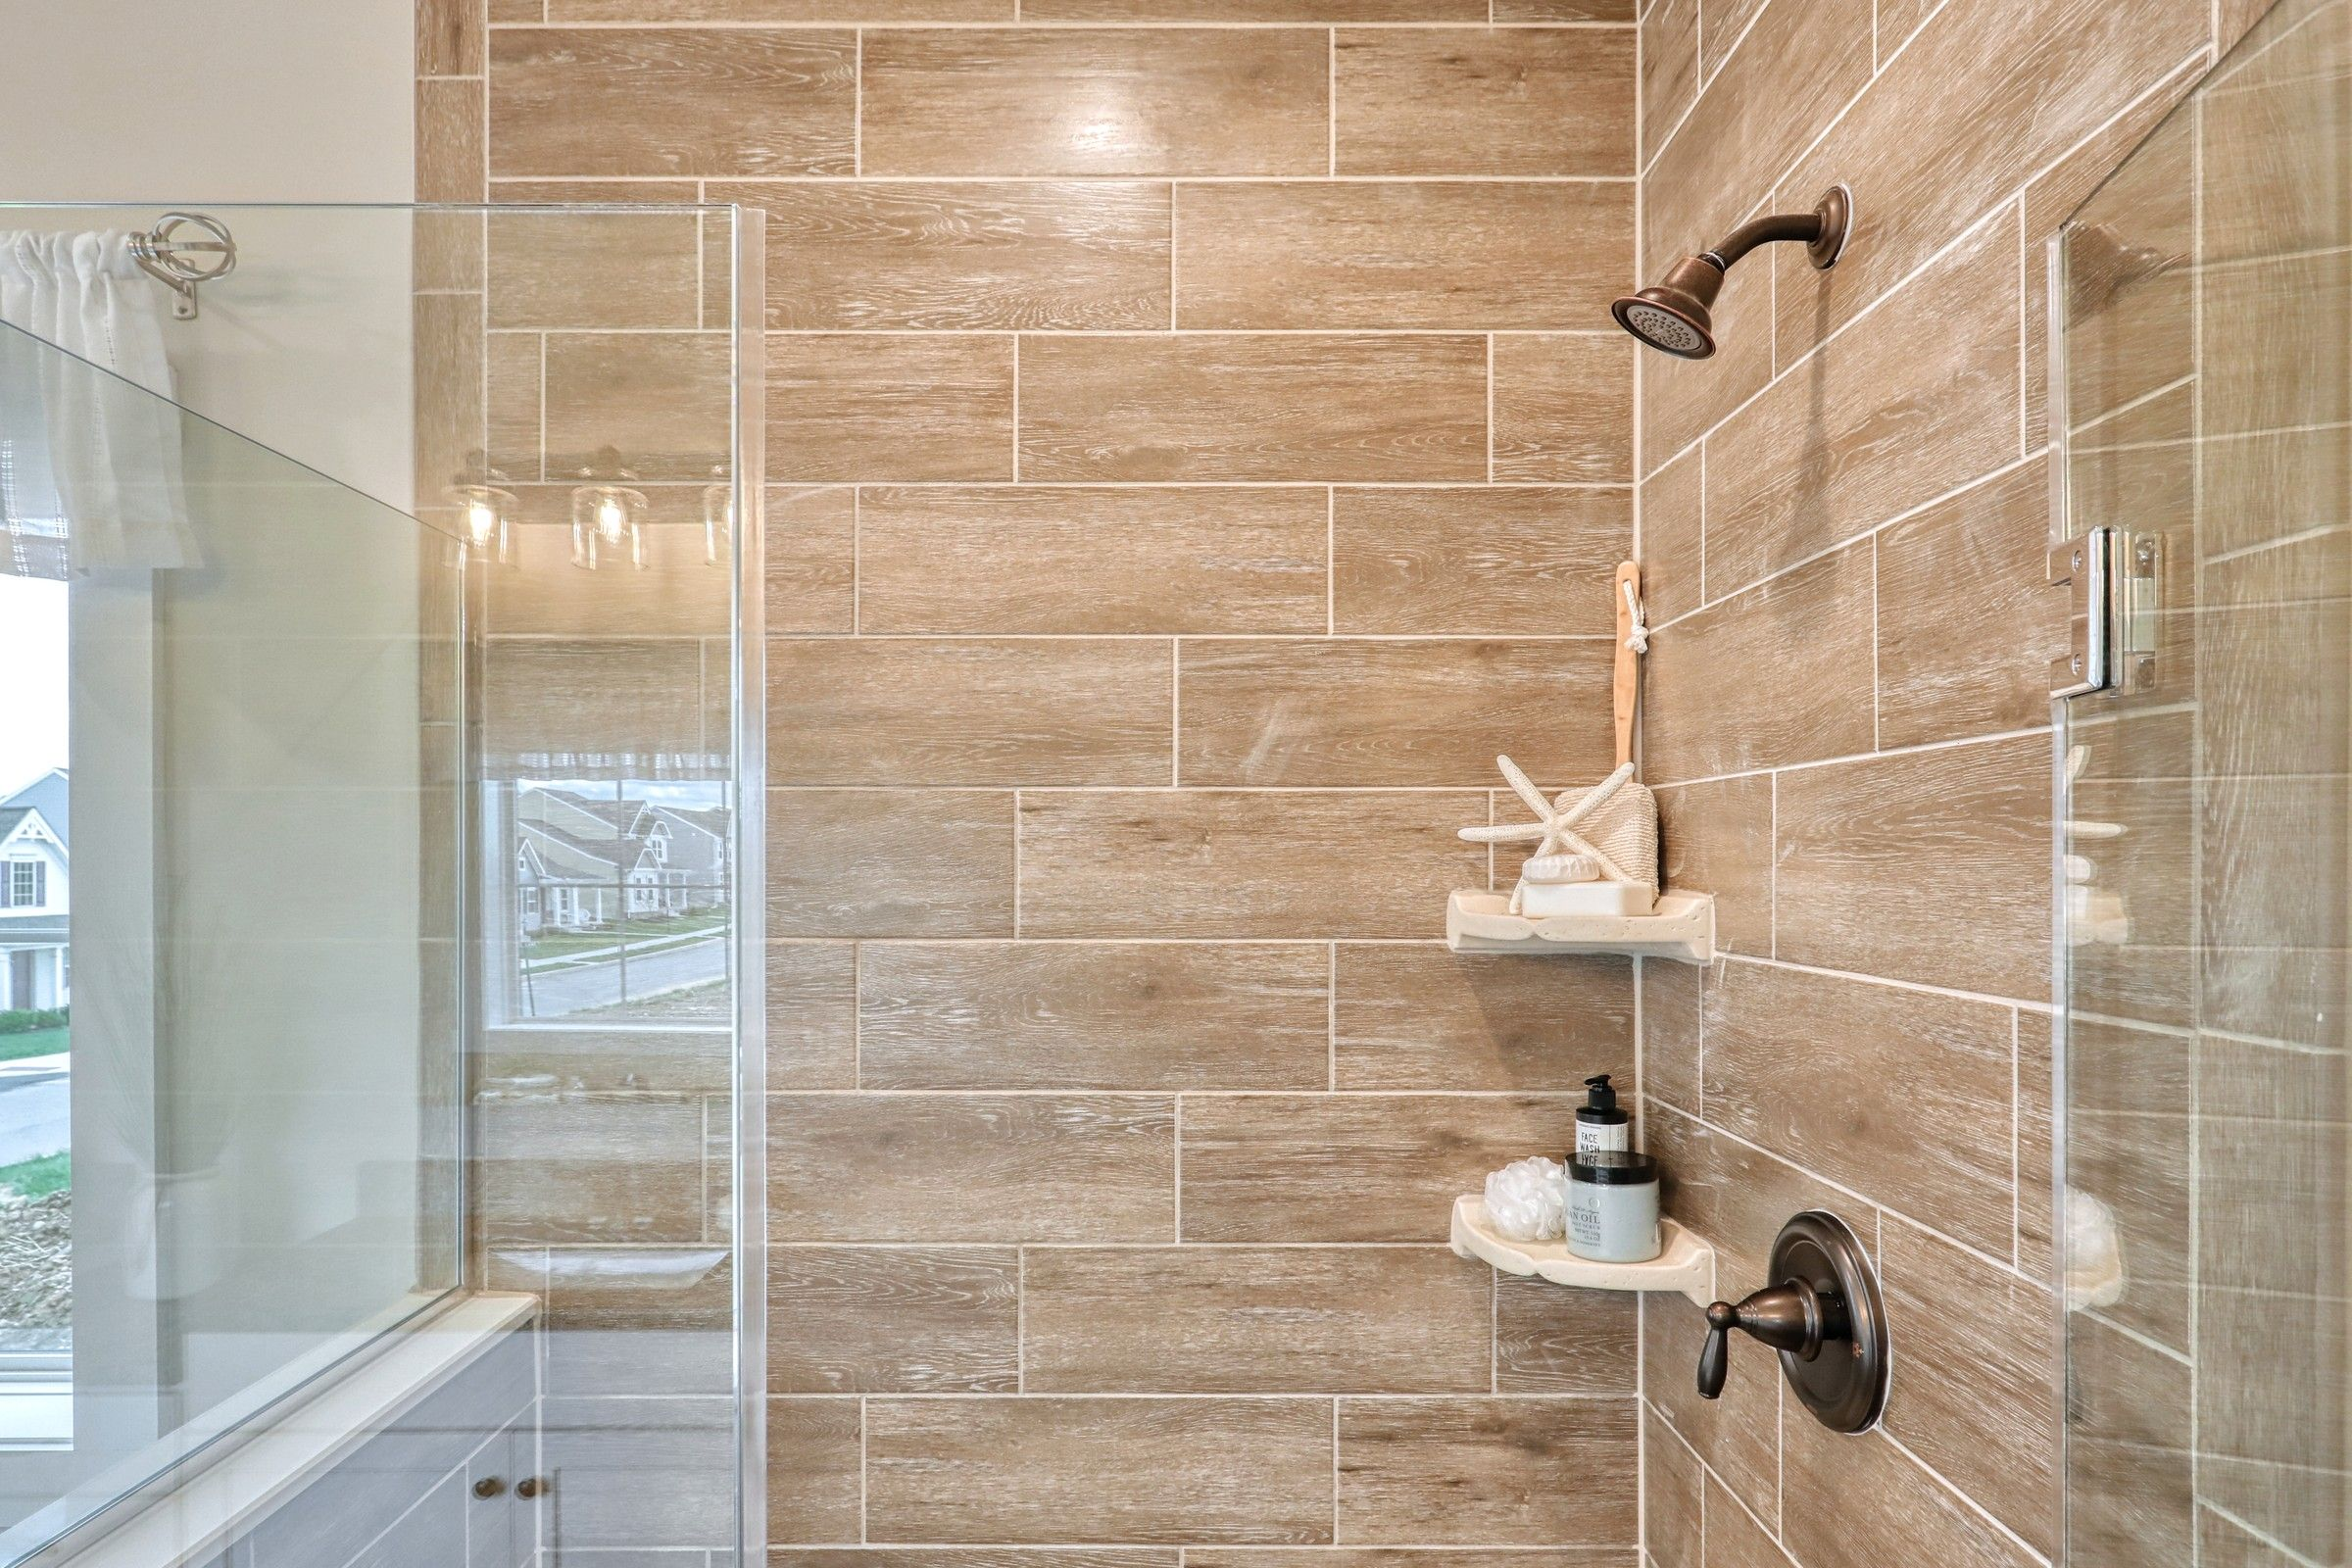 Bathroom featured in the Milton Vintage By Keystone Custom Homes in Philadelphia, PA